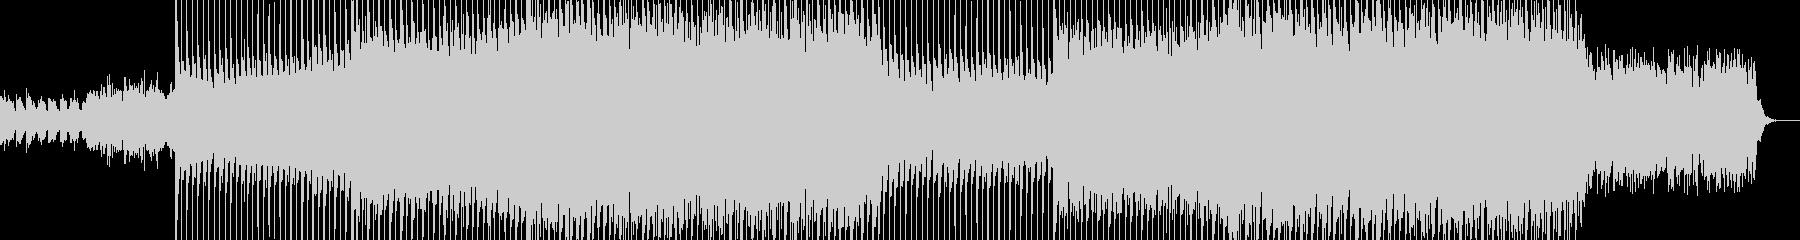 EDMポップで明るいクラブ系-44の未再生の波形